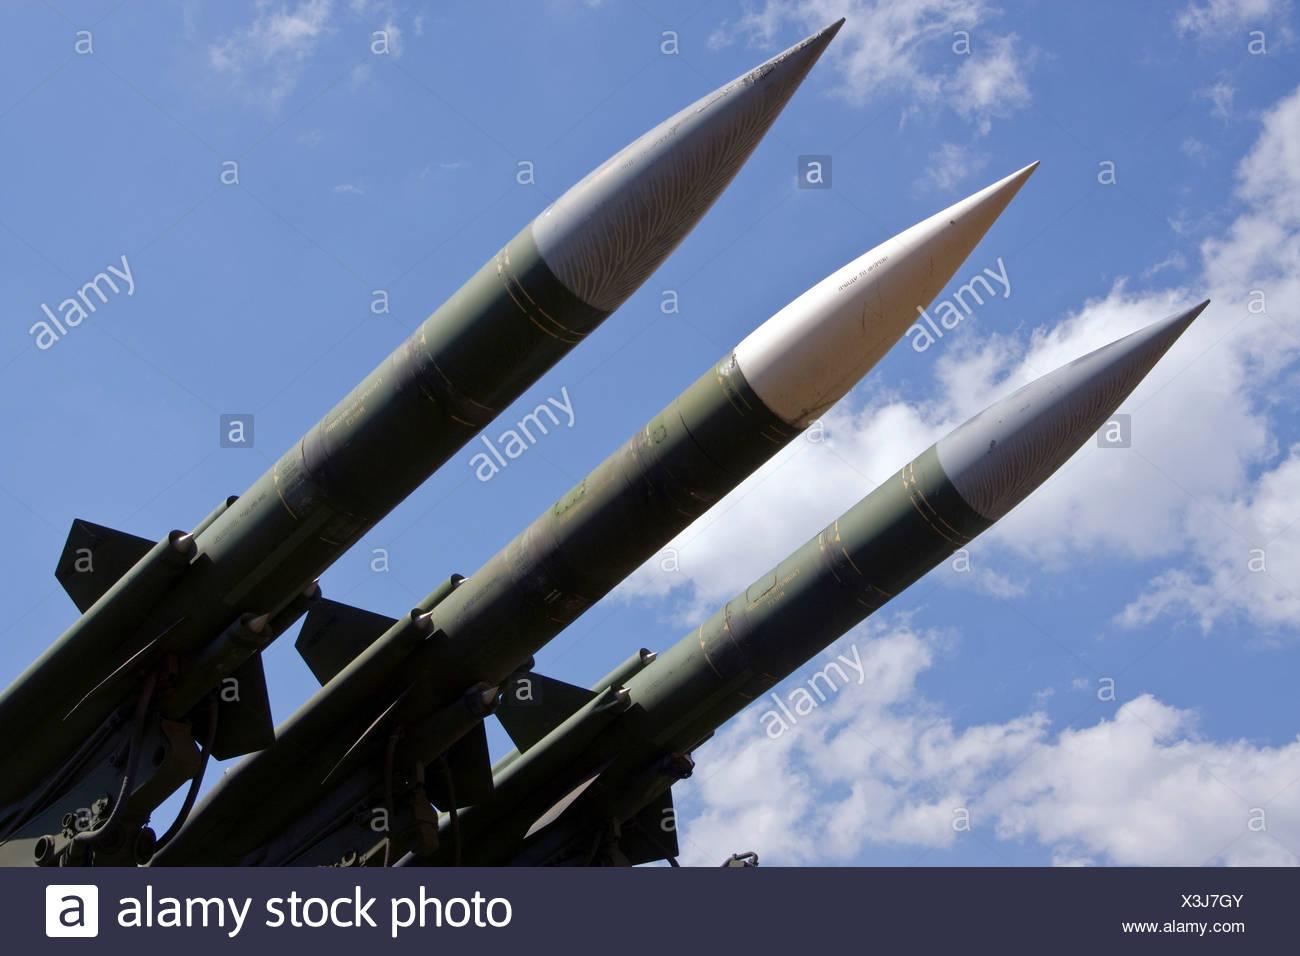 Soviet anti-aircraft missile 3M9 - Stock Image